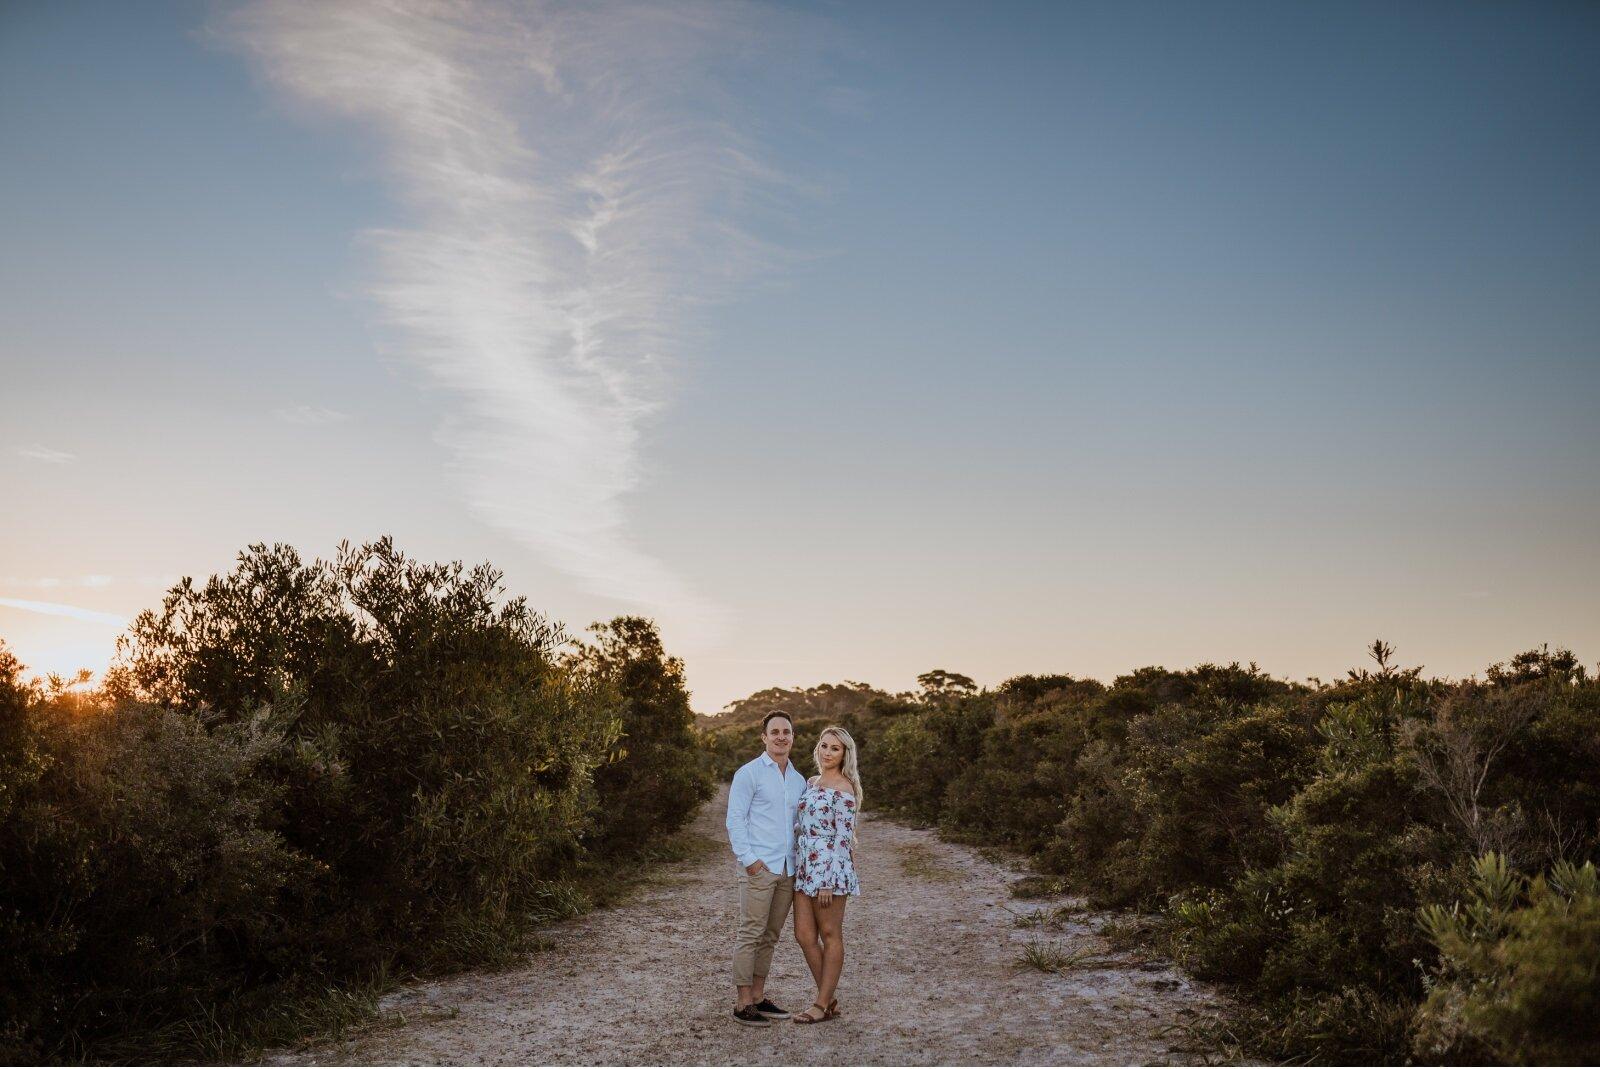 newcastle-wedding-photographer-dudley-engagement-shoot-14.jpg